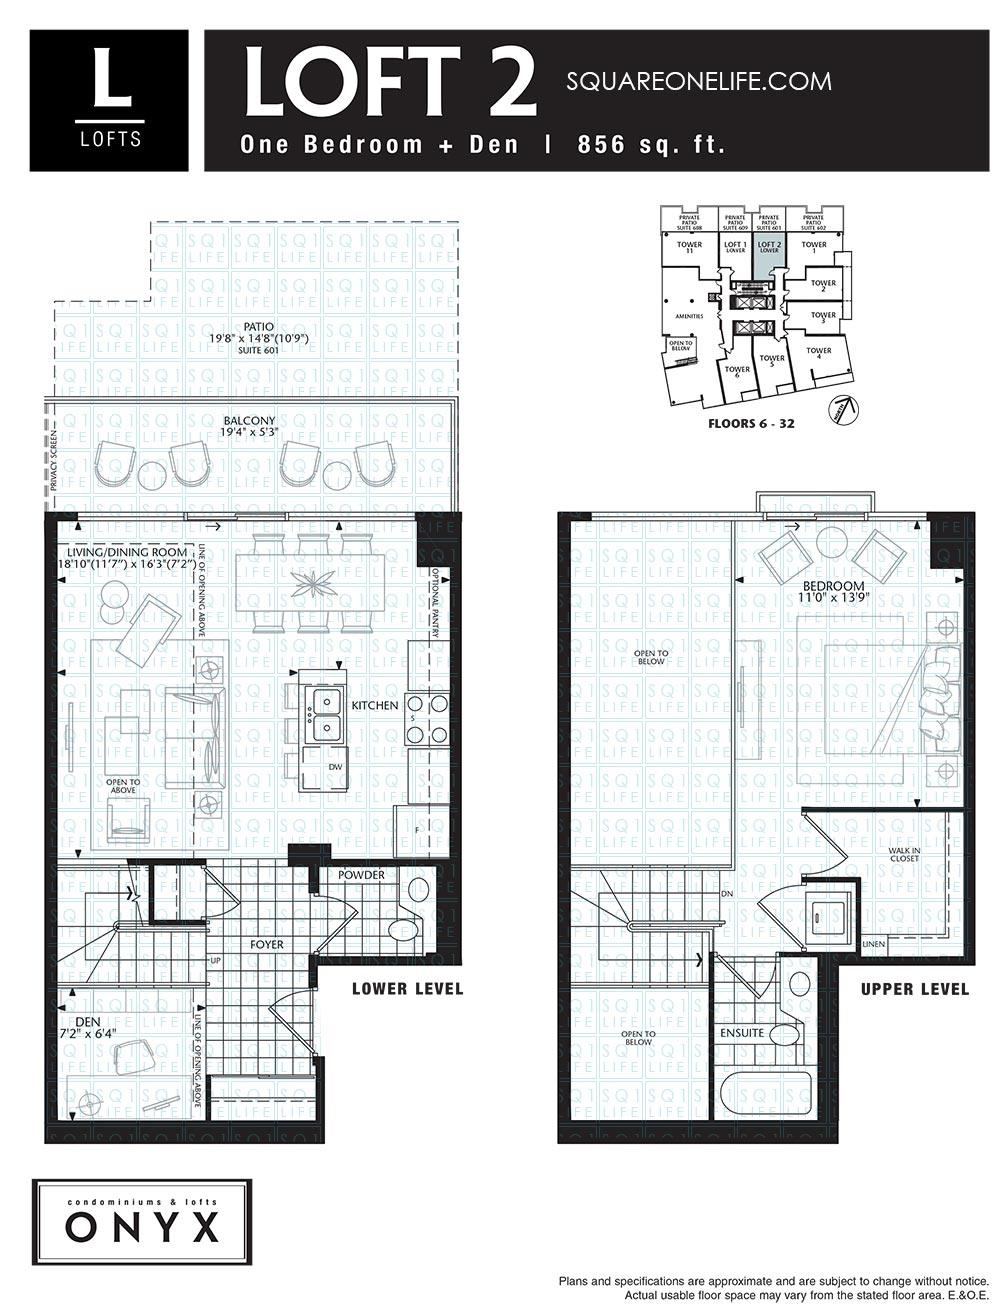 223-Webb-Dr-Onyx-Condo-Floorplan-Loft-2-1-Bed-1-Den onyx condo Onyx Condo 223 Webb Dr Onyx Condo Floorplan Loft 2 1 Bed 1 Den